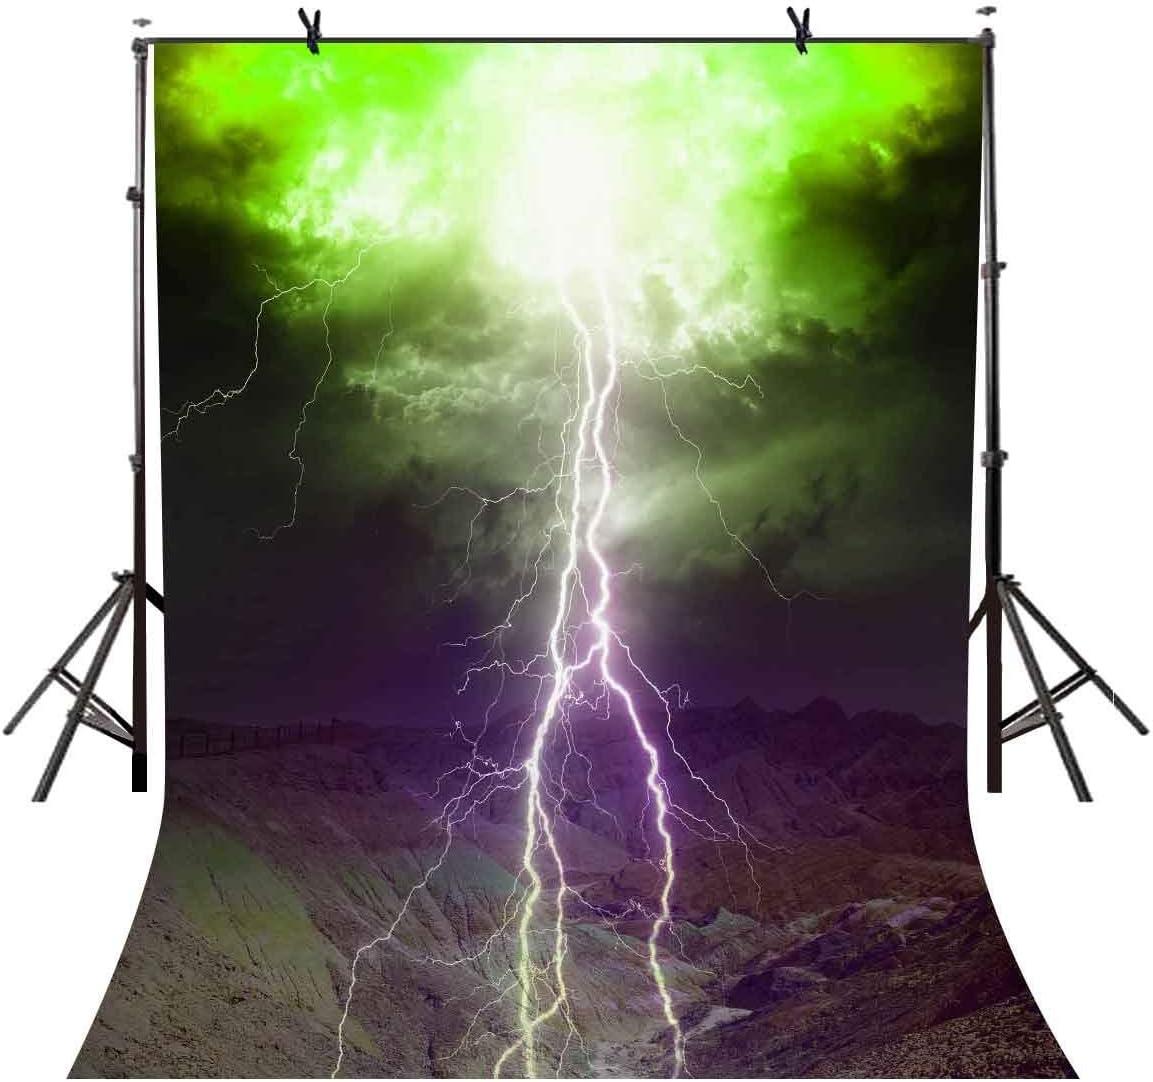 GoEoo 5x7ft Lightning Backdrop Thunder Lightning Stormy Photography Backdrop Photo Studio Background Props LYXC072